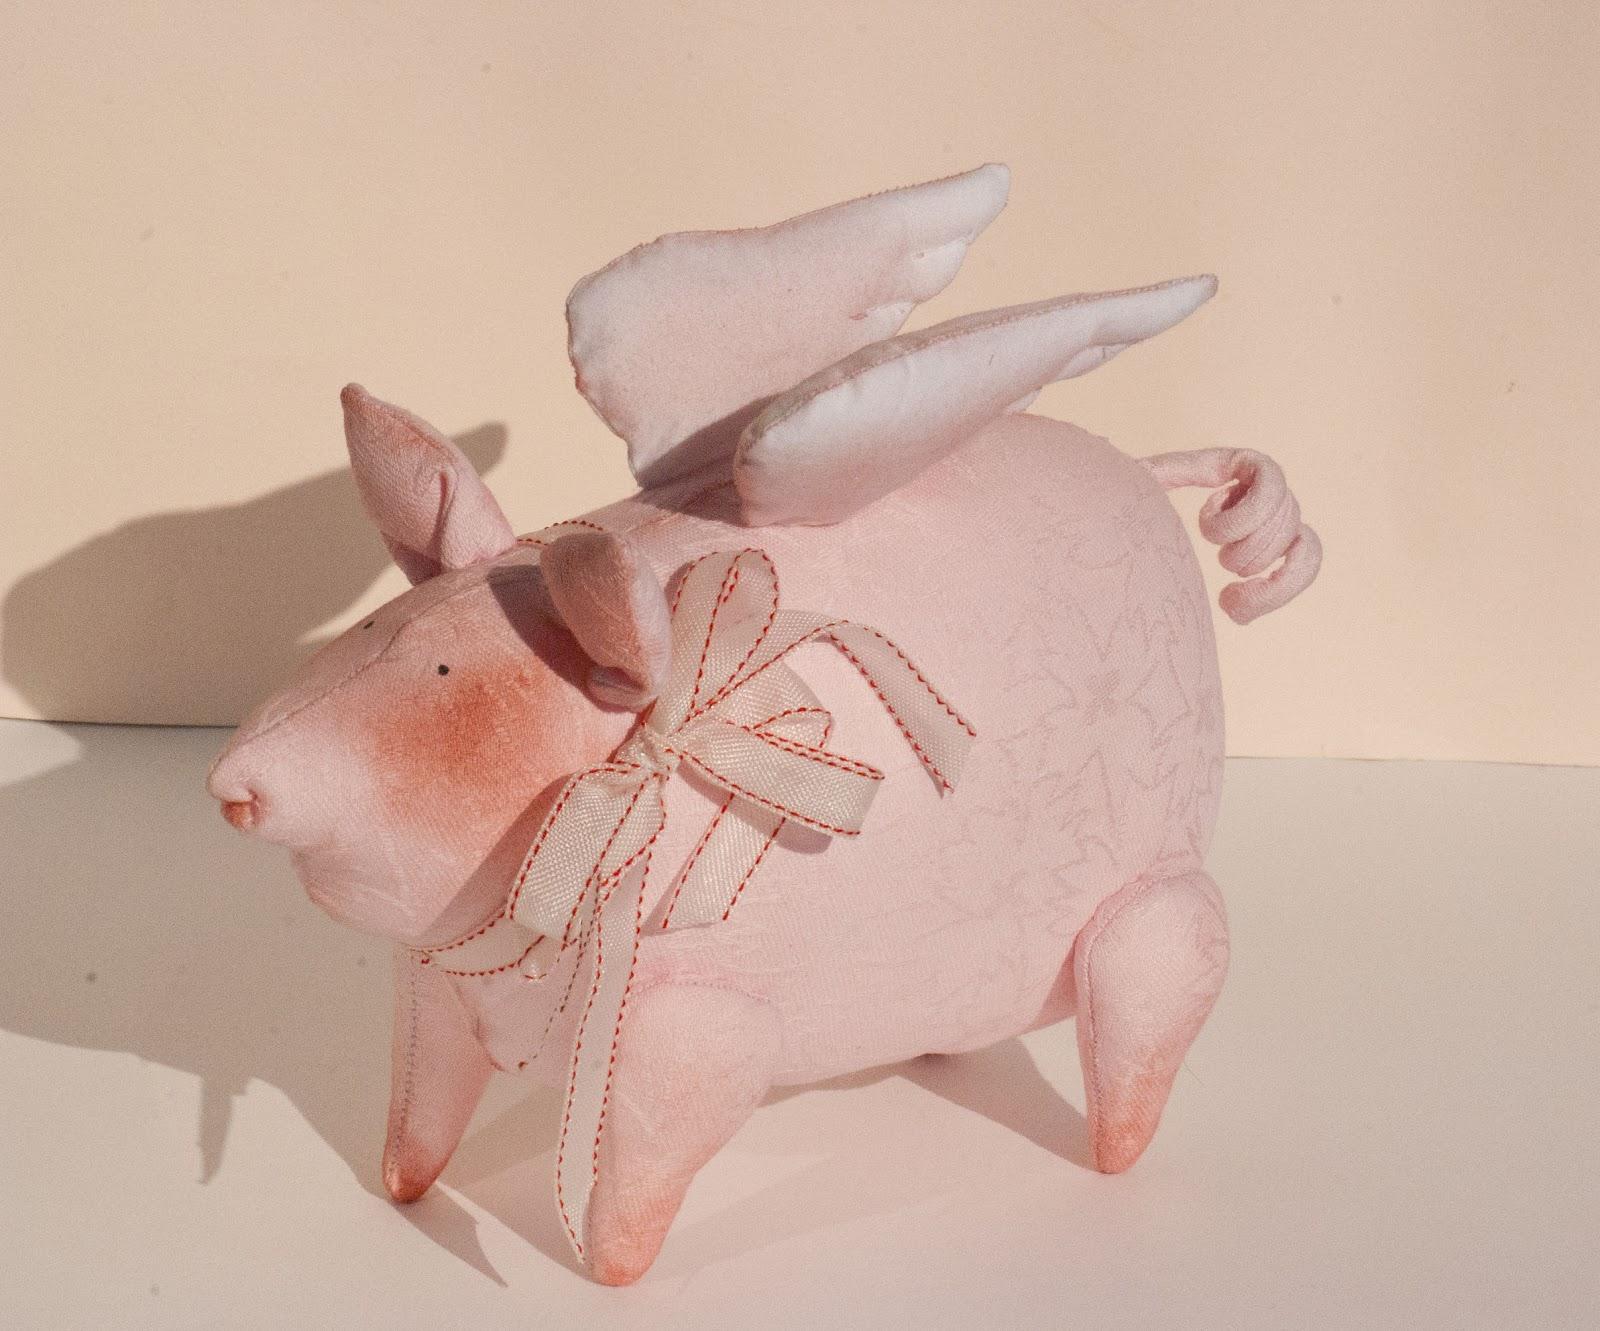 схема свинки для шитья